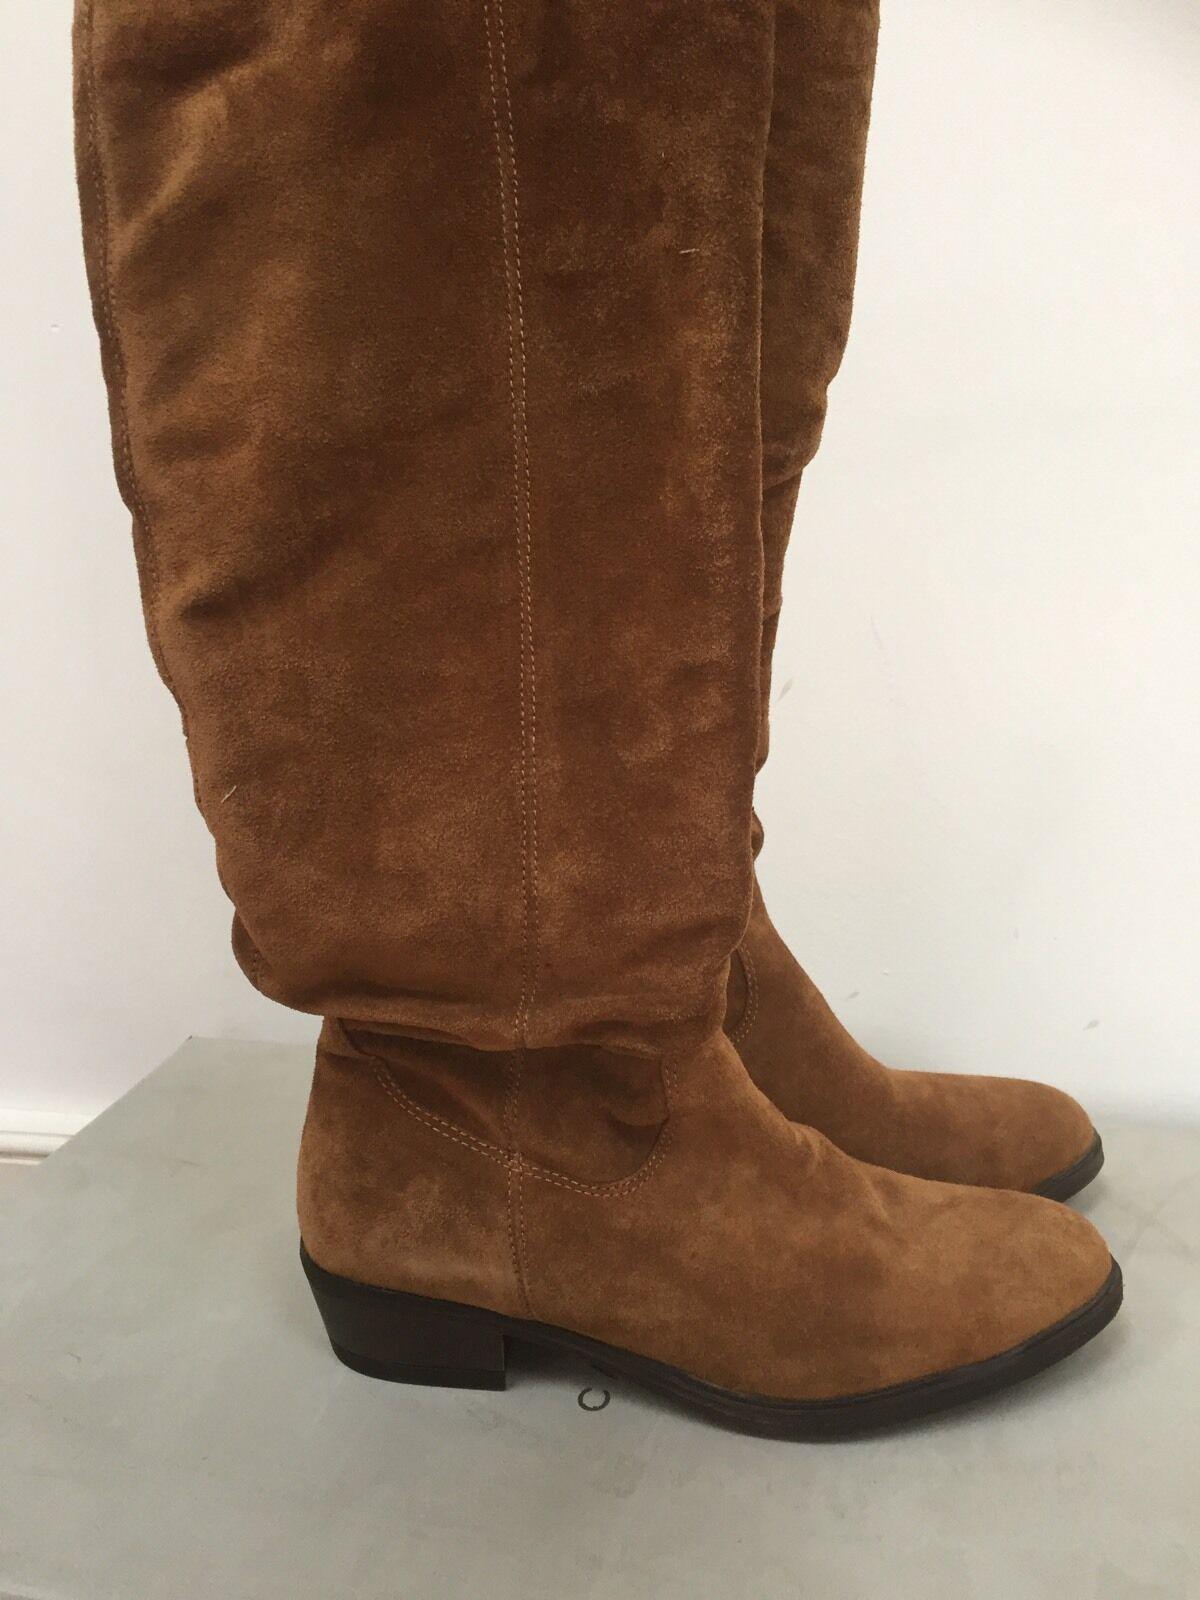 Carvela Kurt Geiger Suede Stiefel    Leather schuhe Größe 4 Euro 37 d3265f